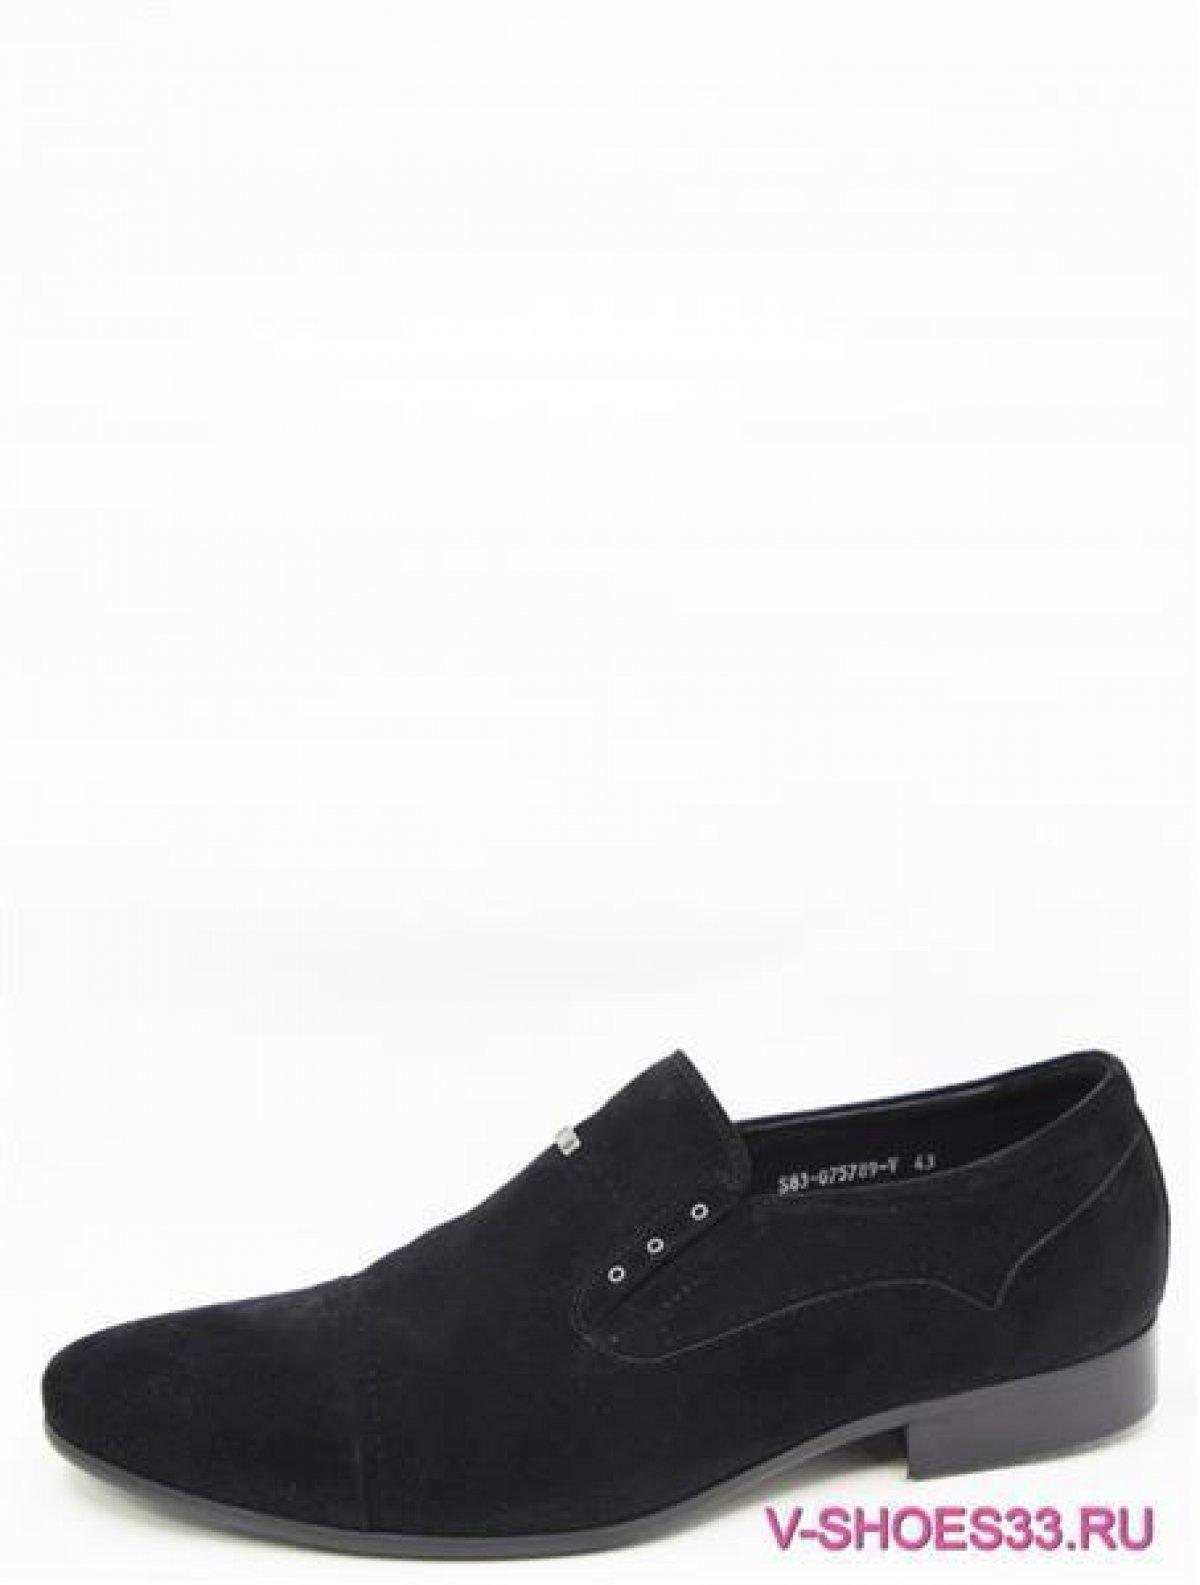 S83-075789 мужские туфли